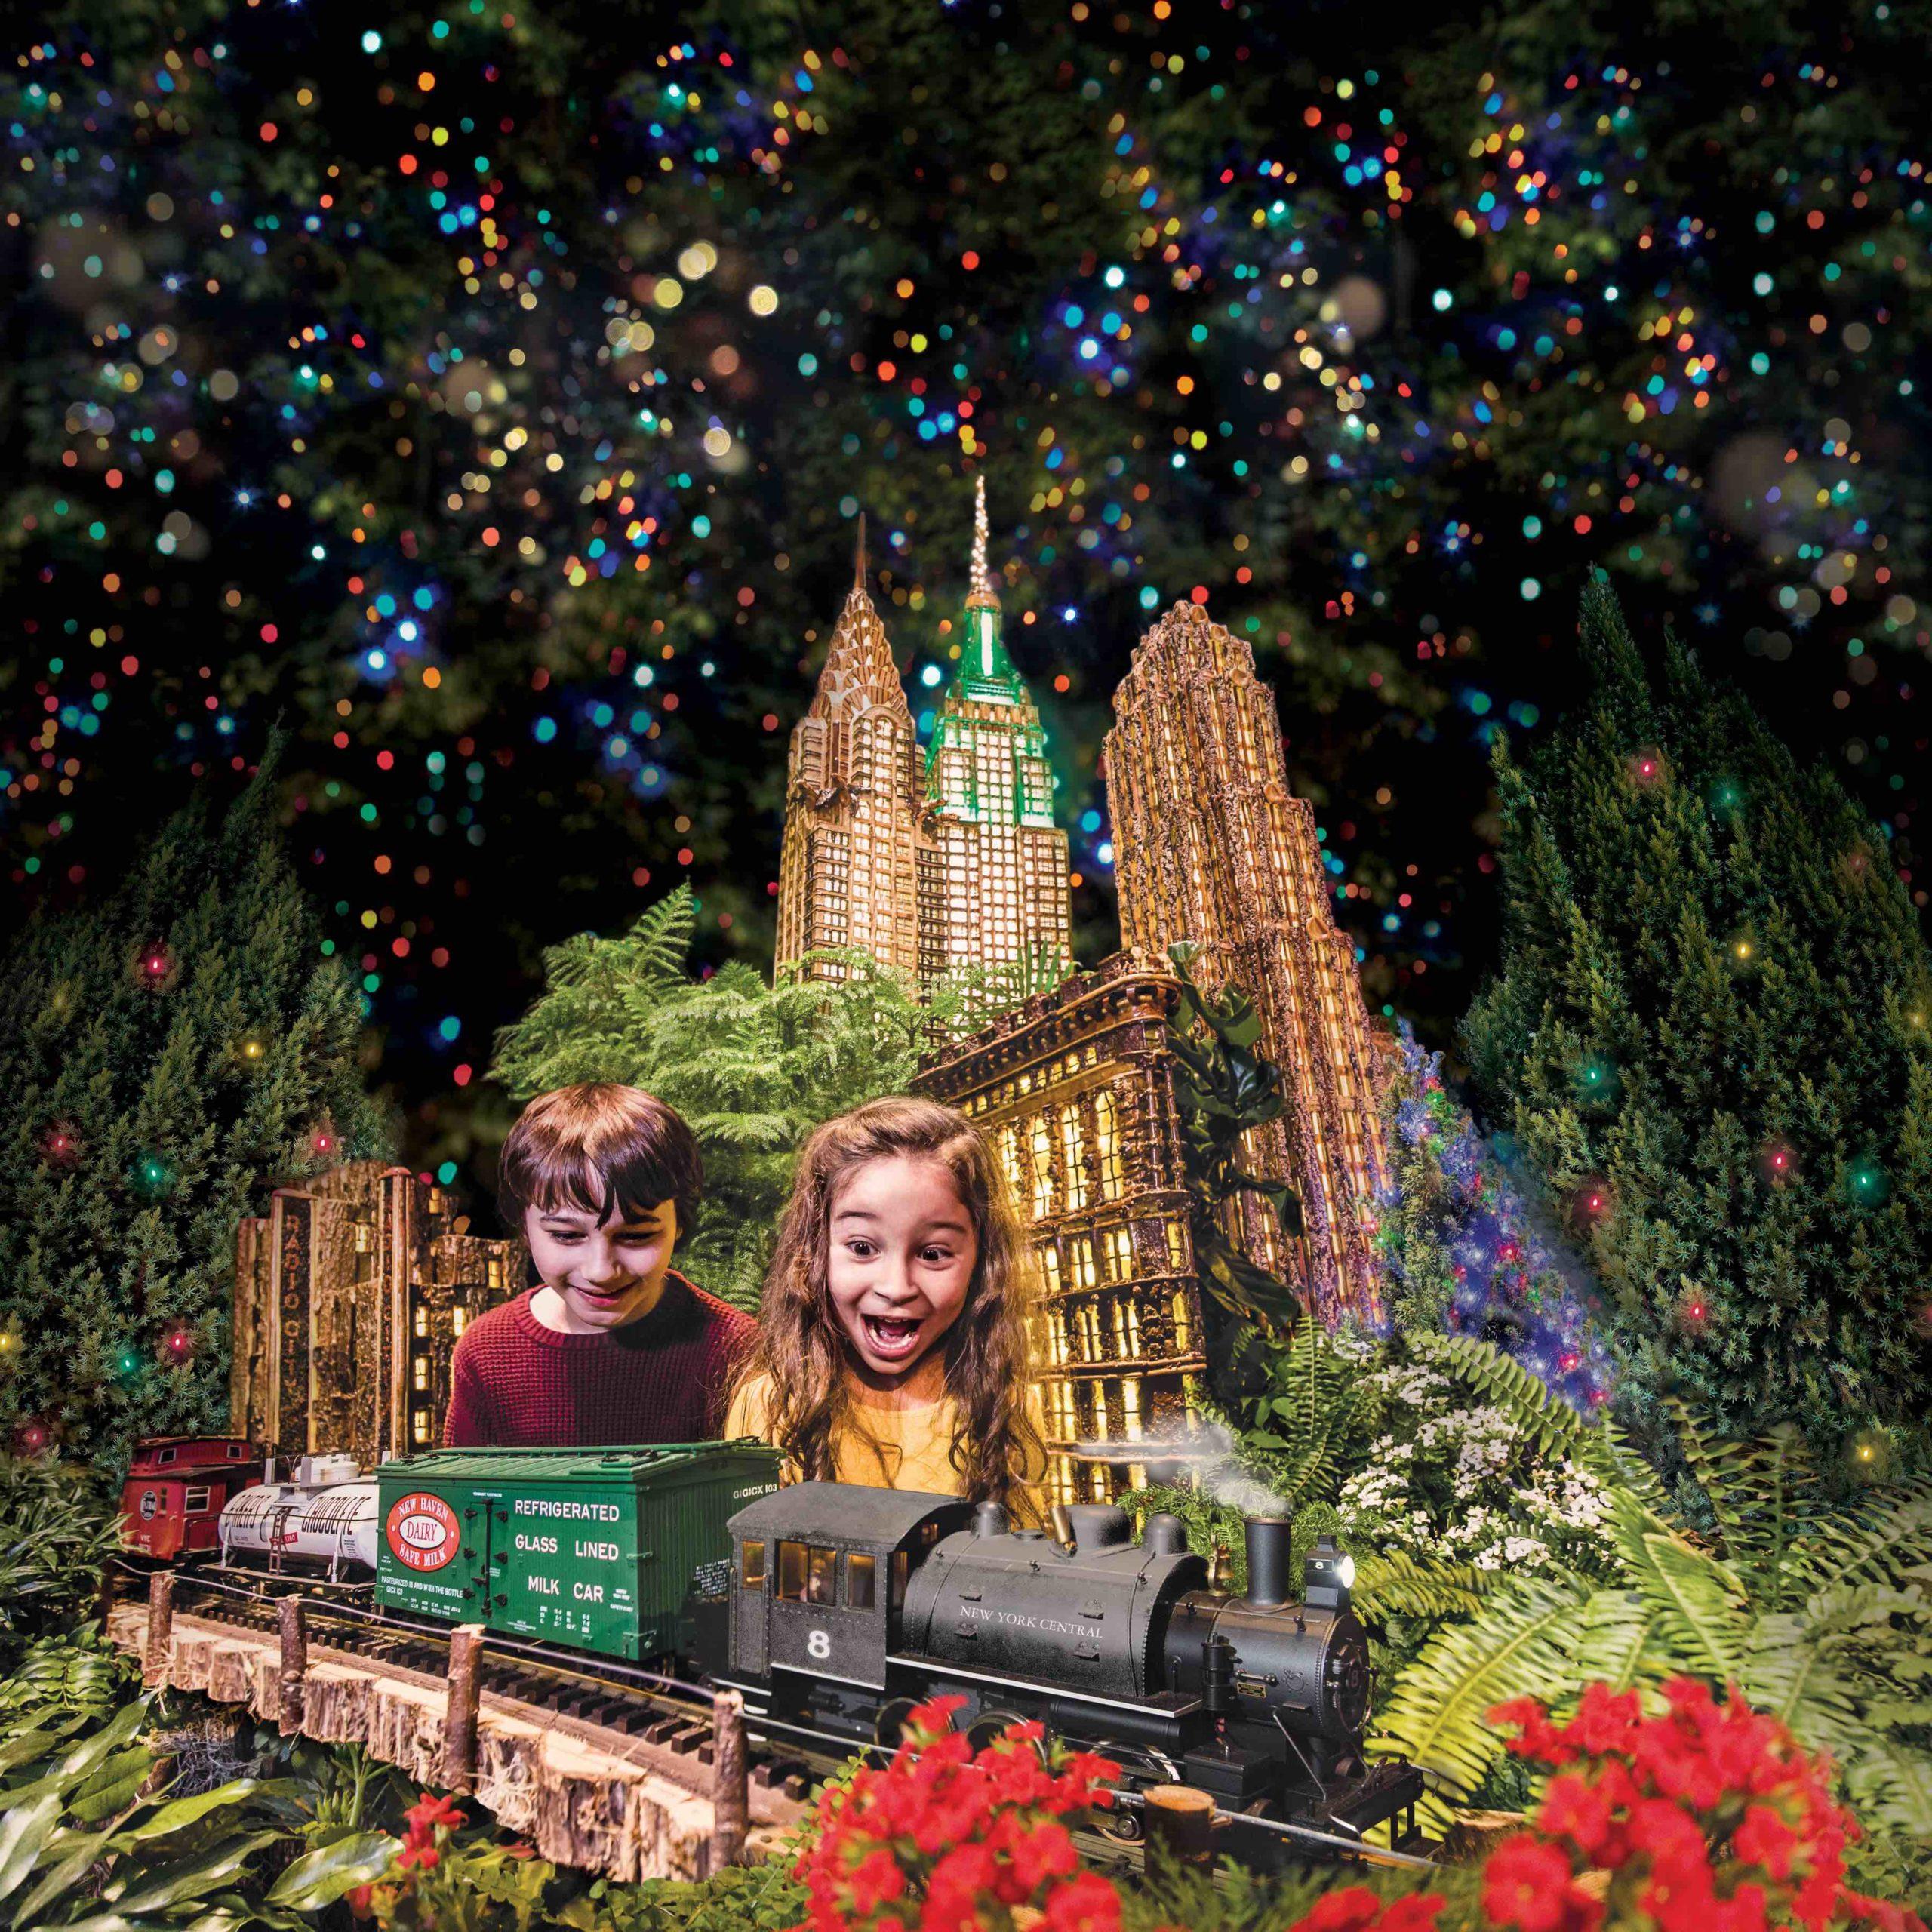 5. New York Botanical Garden Holiday Train Show